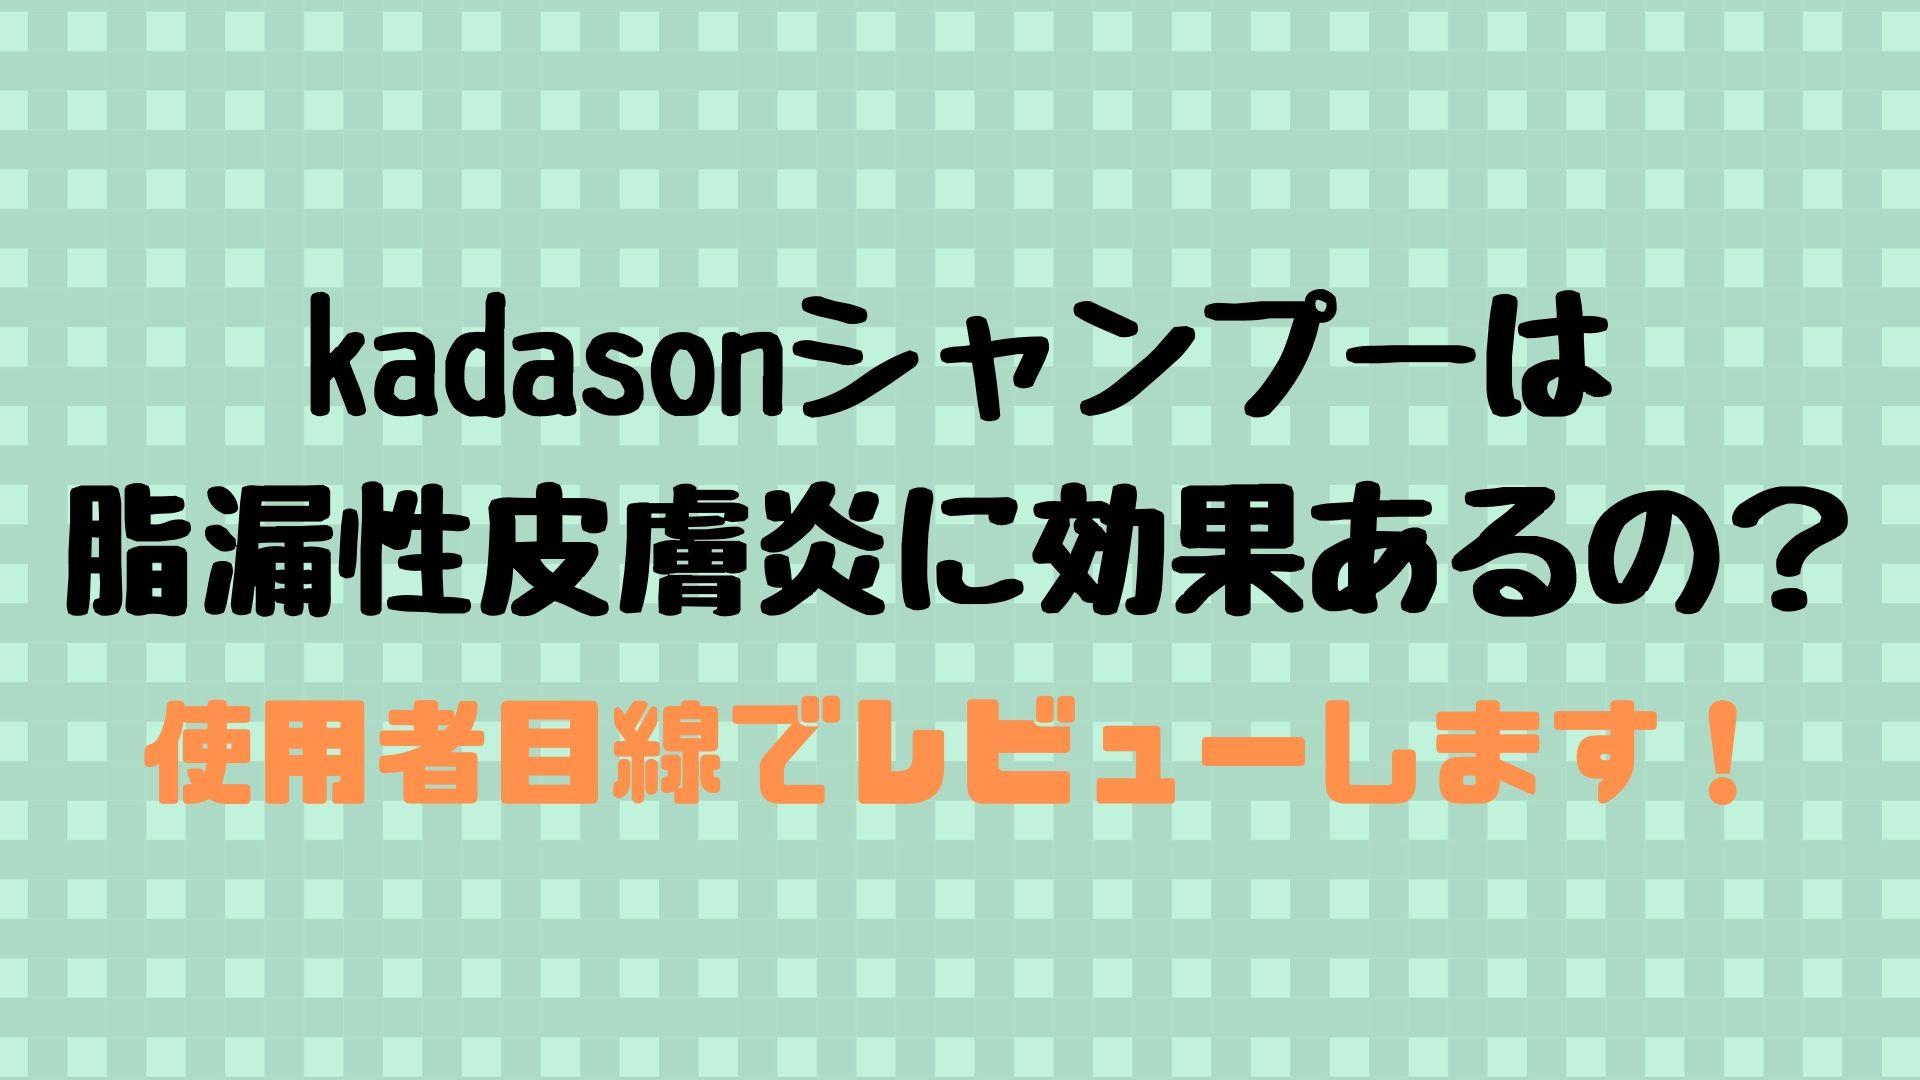 kadasonシャンプーは脂漏性皮膚炎に対して効果あるの?使用感を口コミ&レビュー。